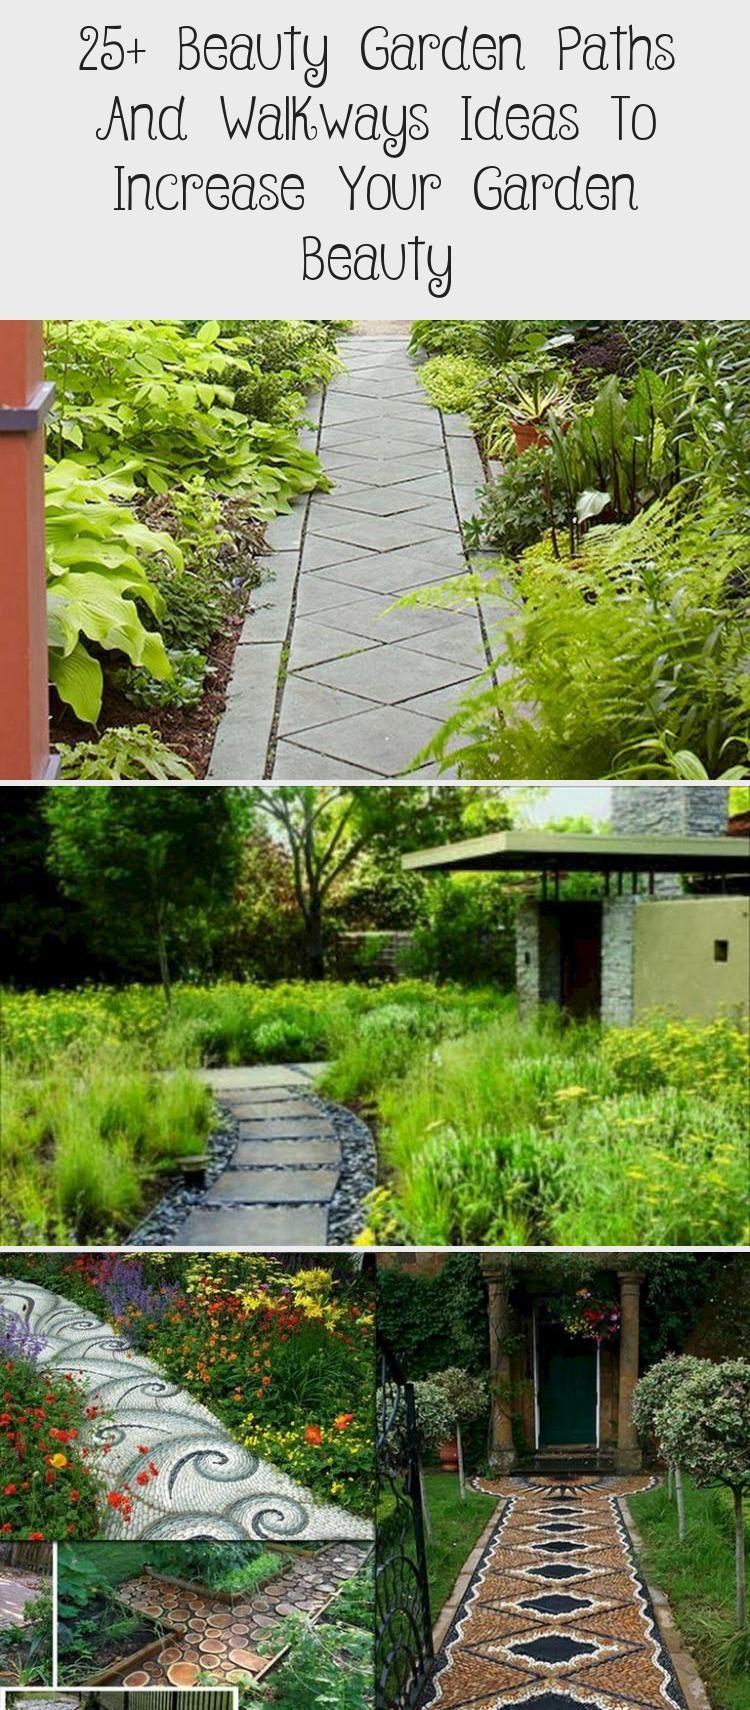 Photo of 25+ Beauty Garden Paths And Walkways Ideas To Increase Your Garden Beauty – Decor Dıy